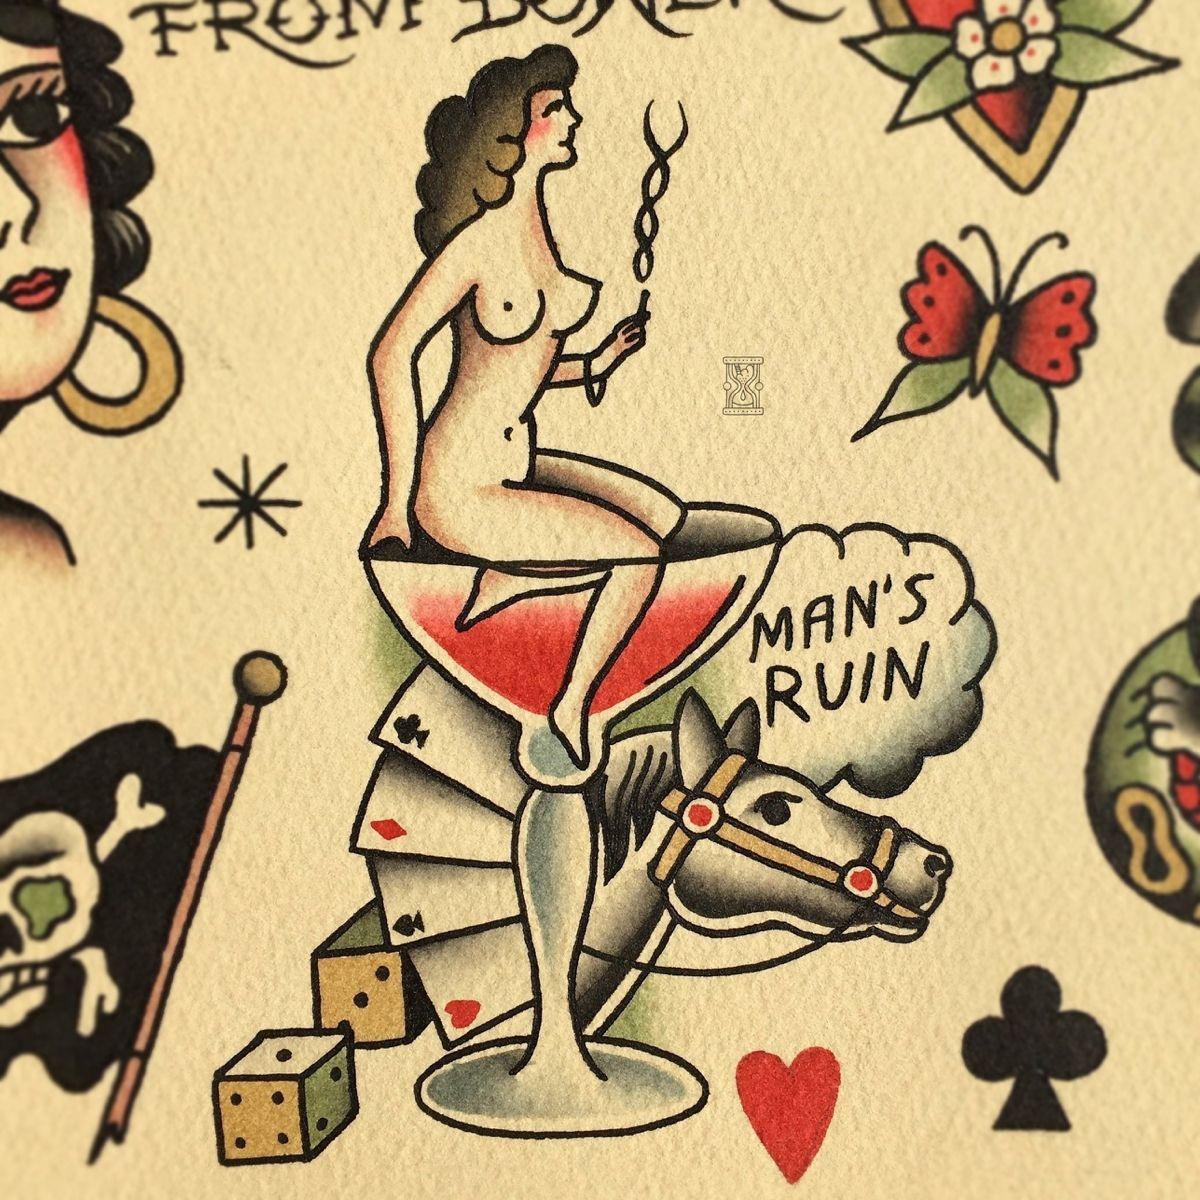 , #girl #girltattoo #sin #sintattoo #bowerytattoo, My Tattoo Blog 2020, My Tattoo Blog 2020